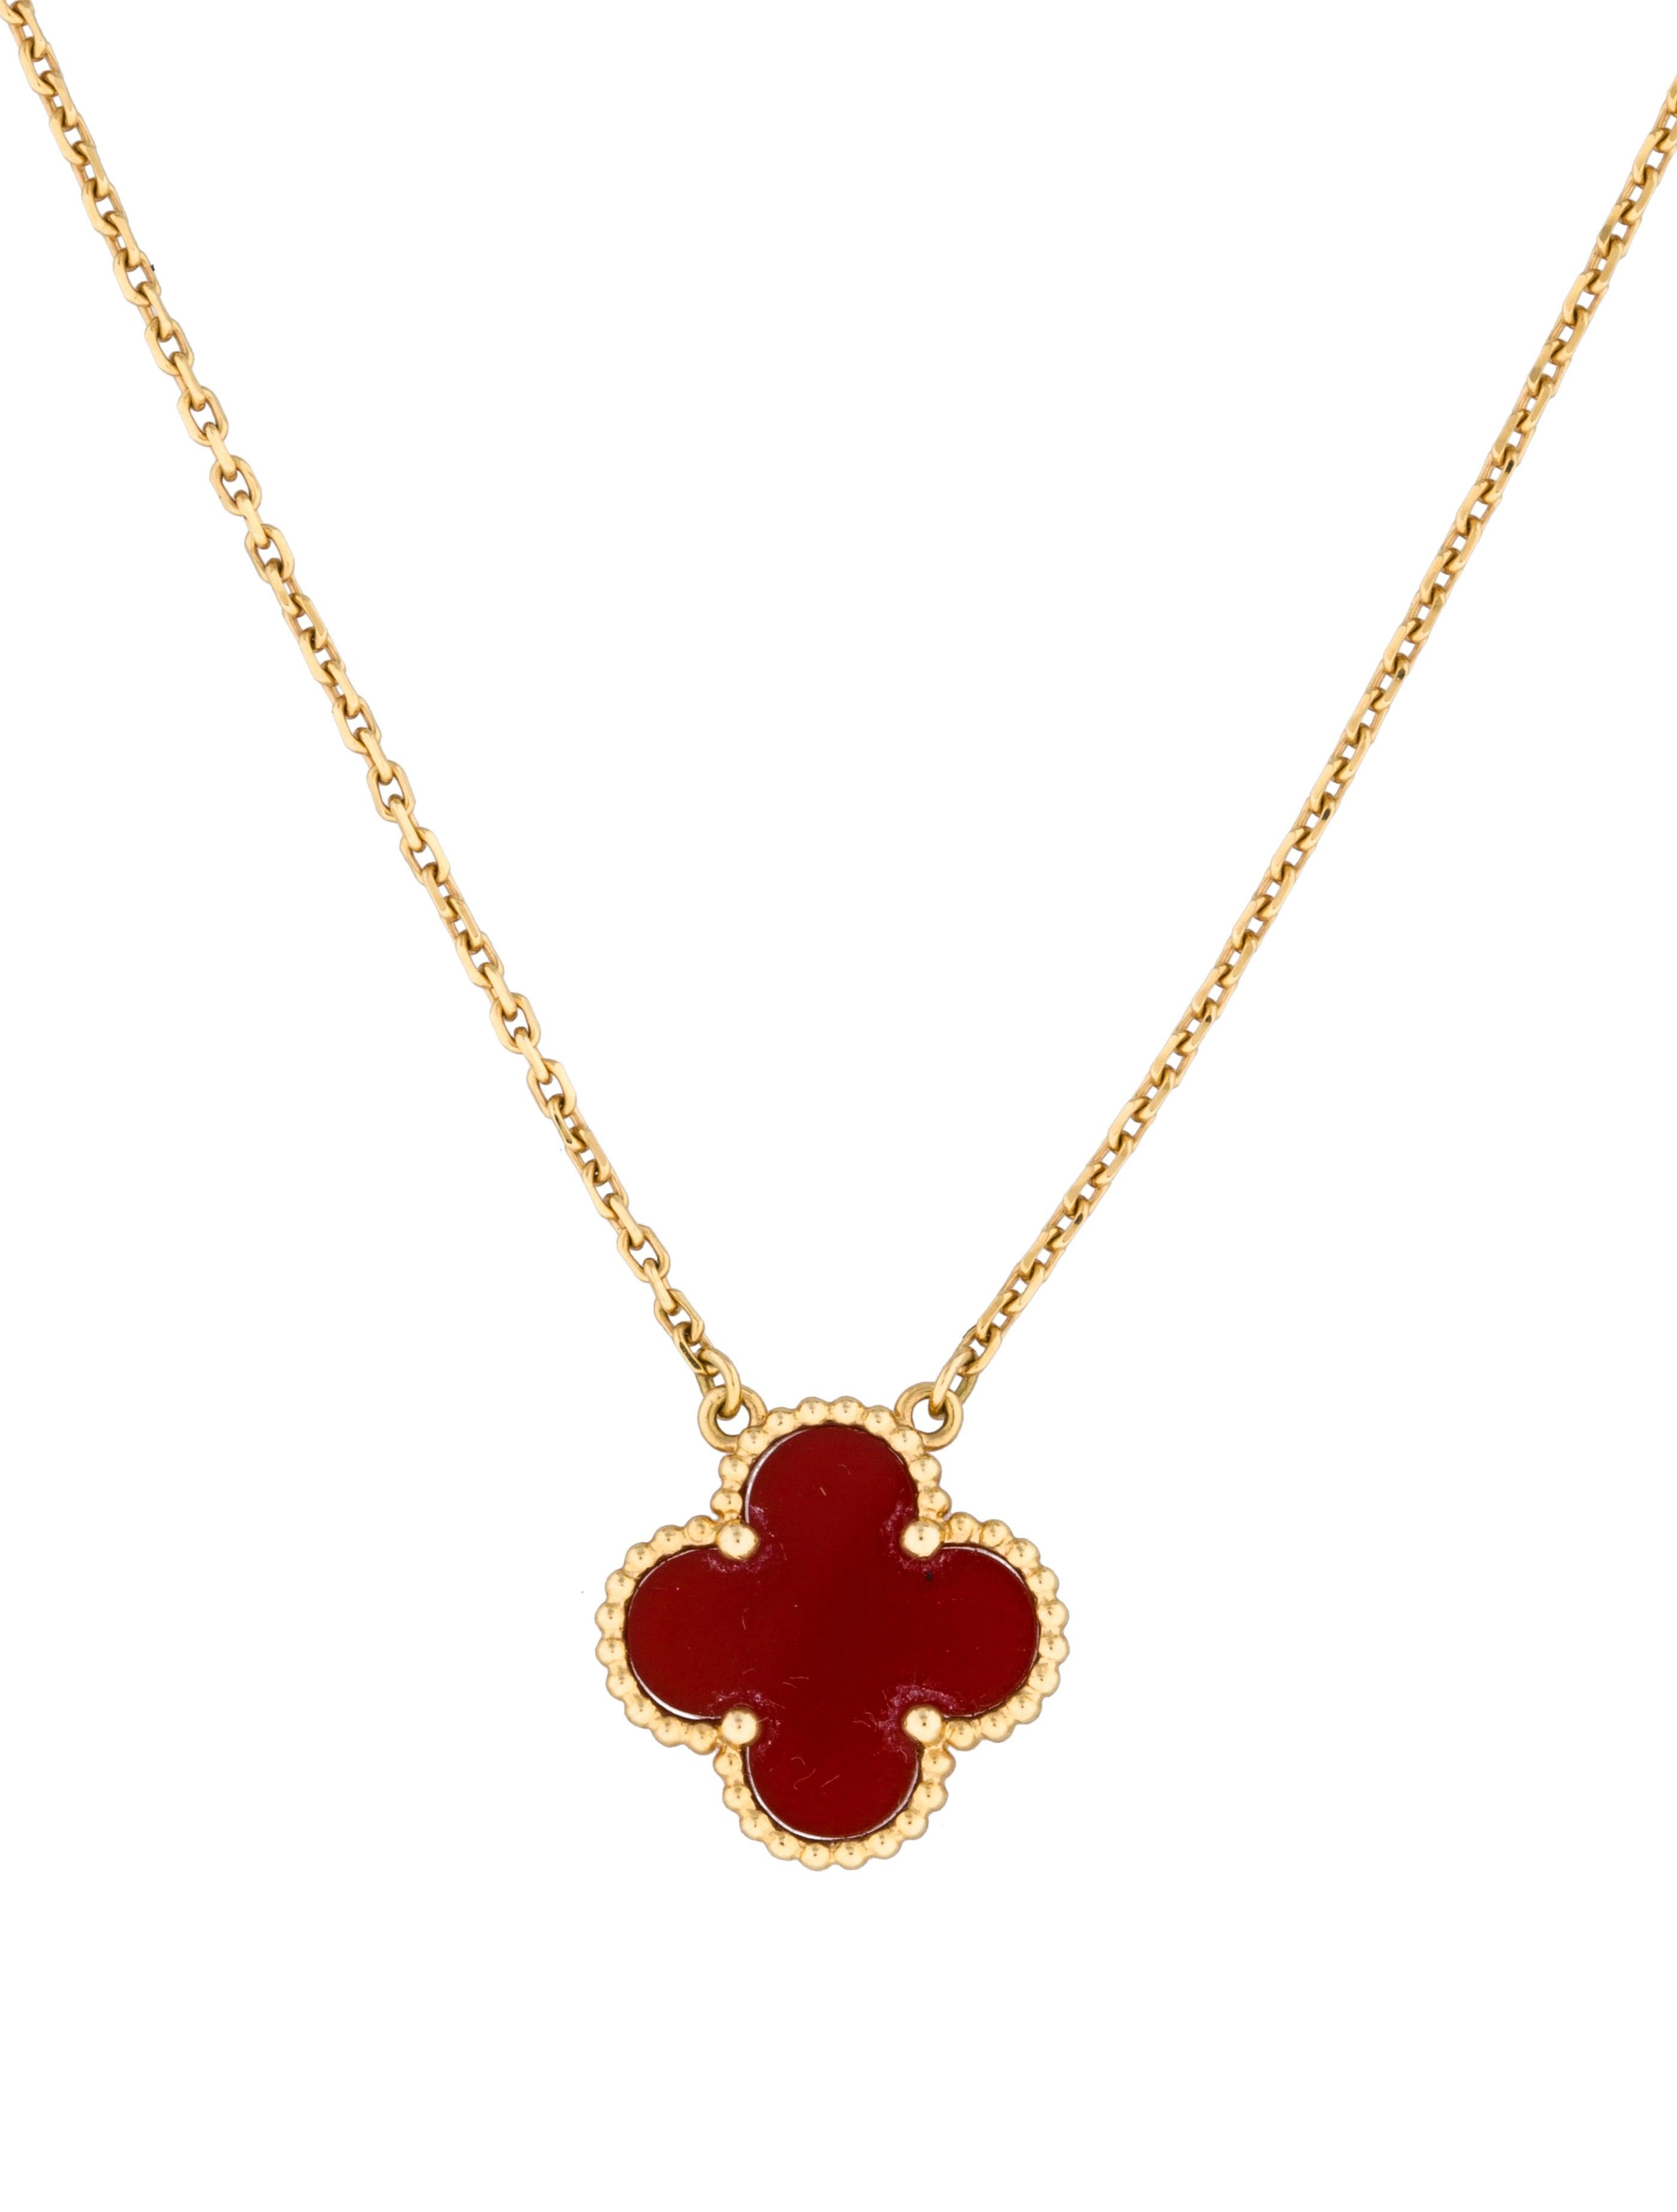 Van Cleef & Arpels Vintage Alhambra Single Motif Necklace ...